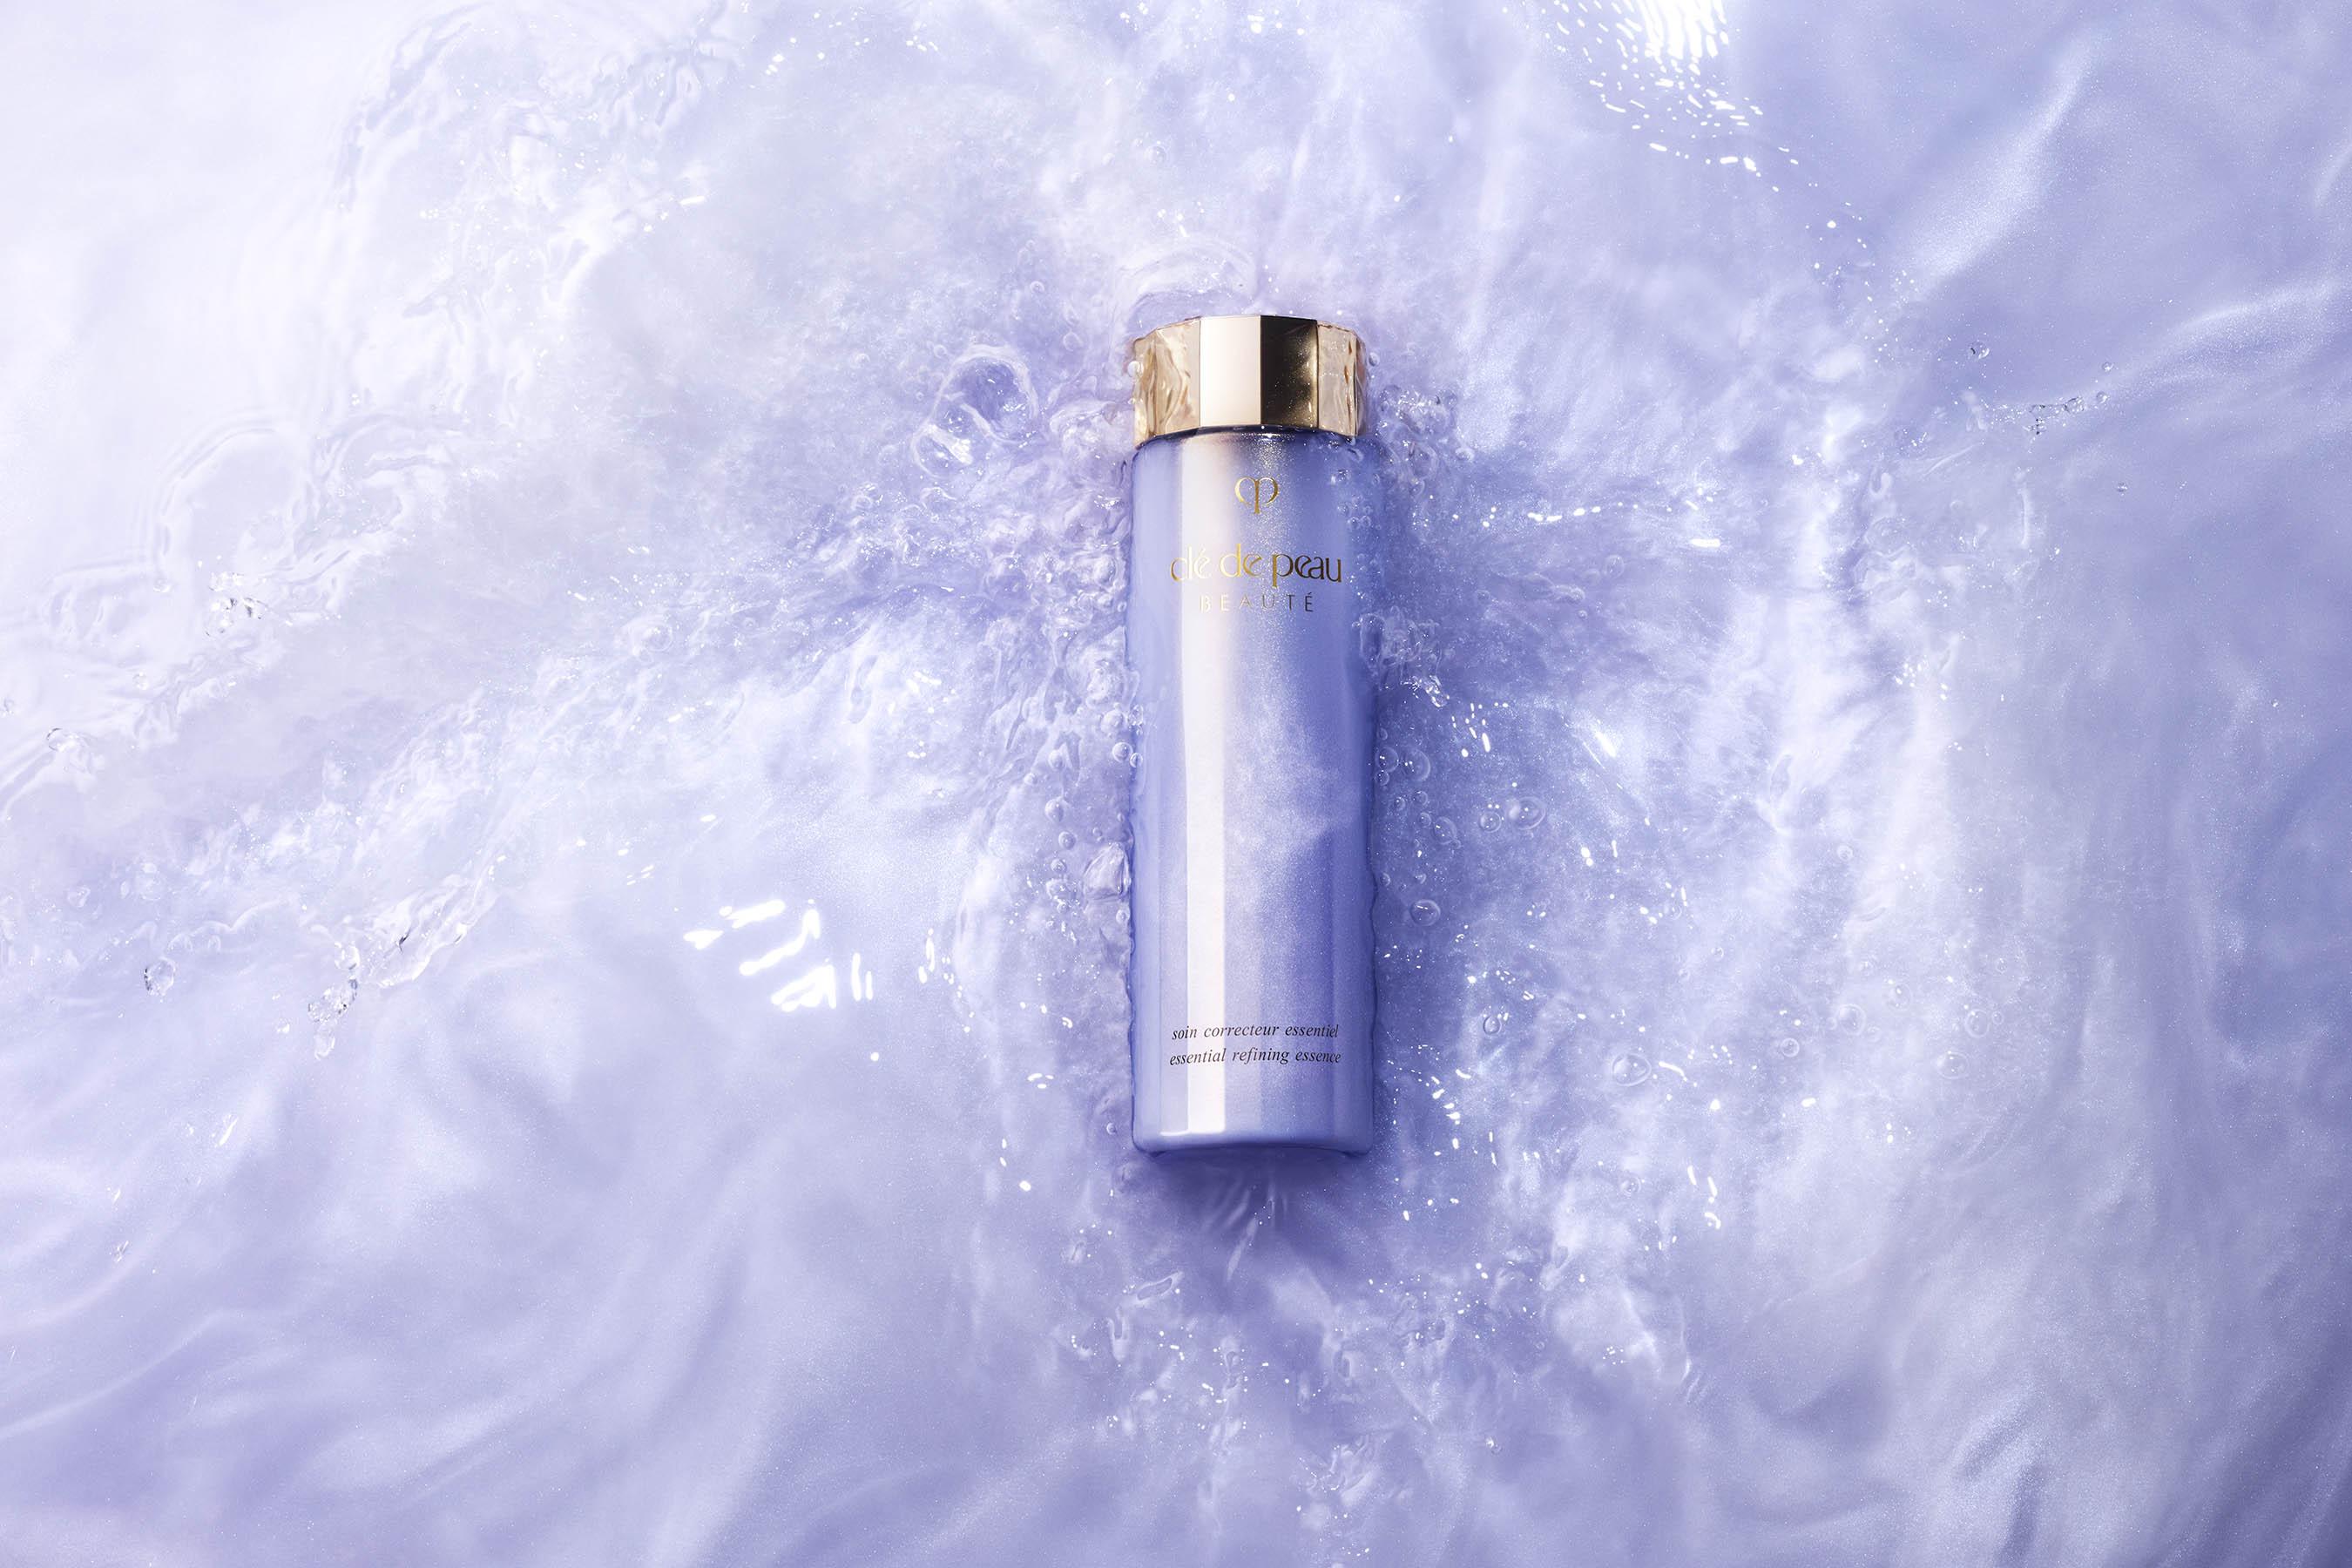 A02shiseido_essential